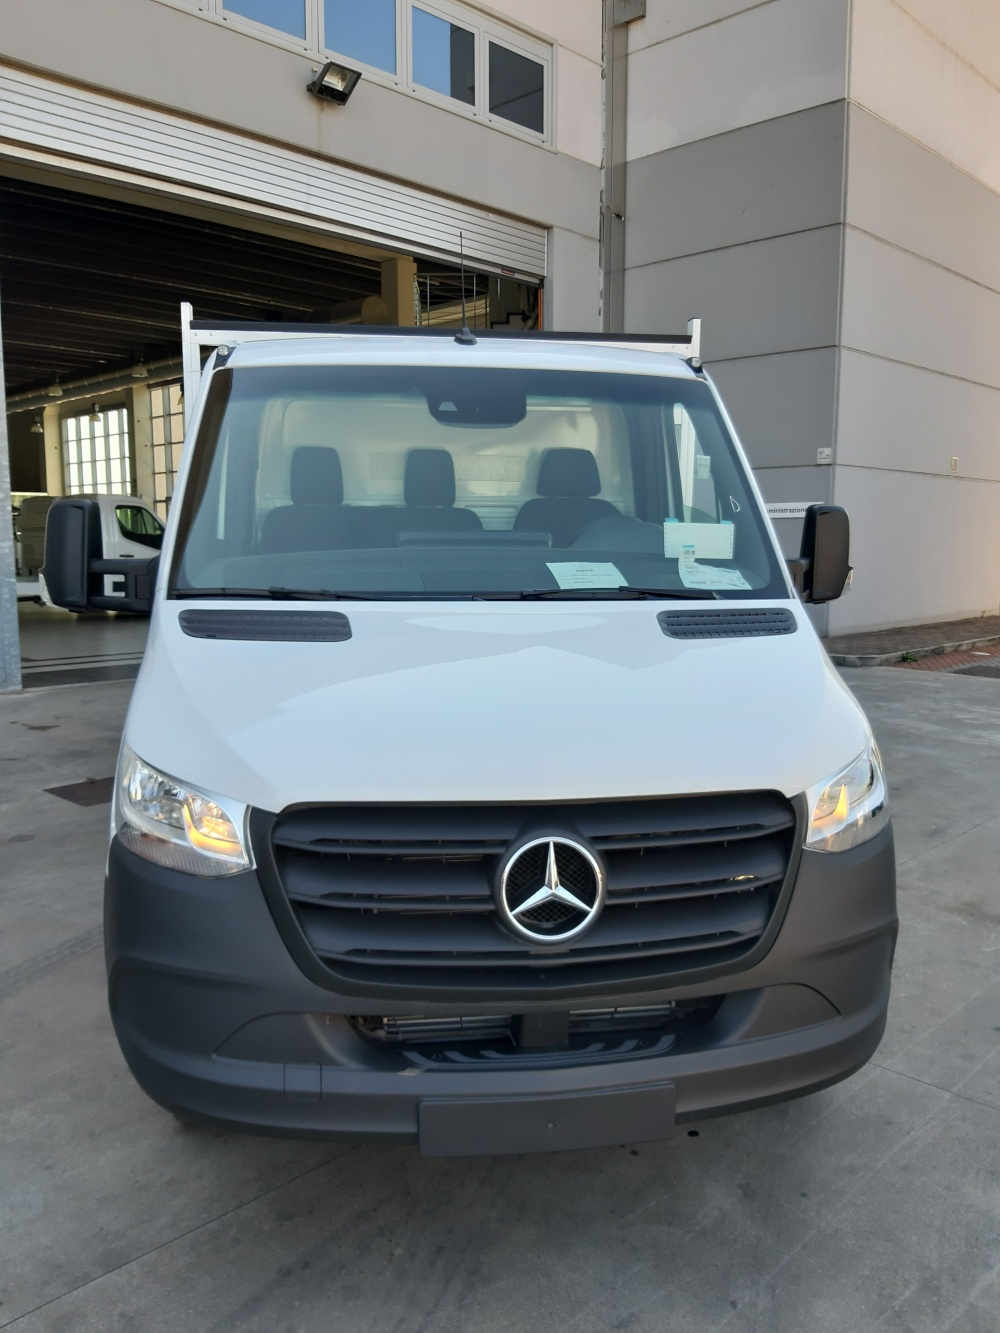 Allestimenti autocarro Mercedes Benz